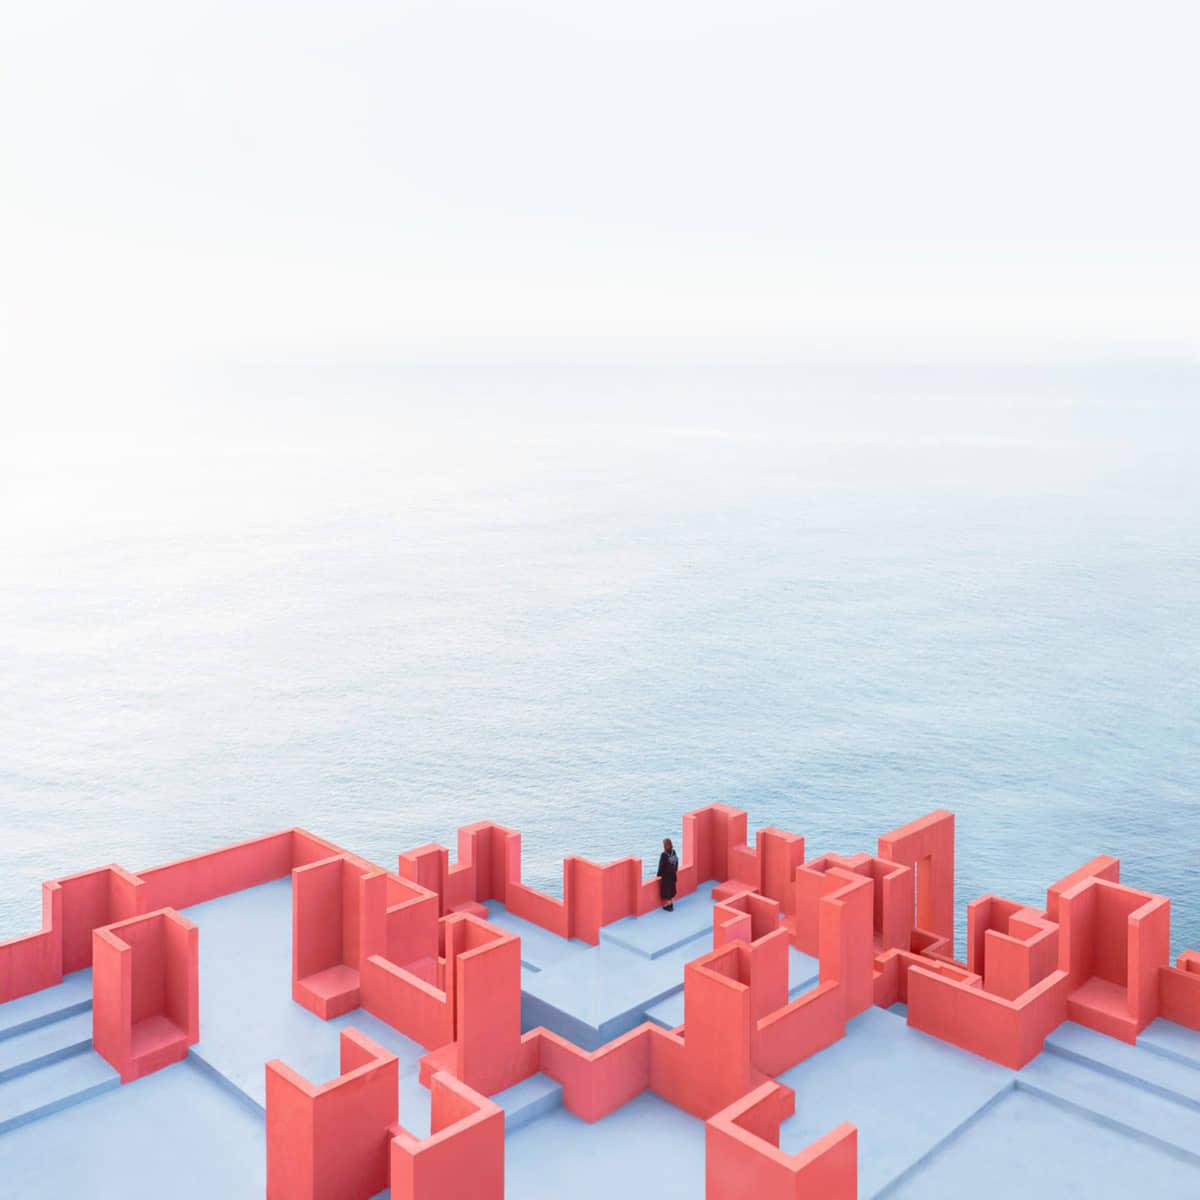 Daniel_Rueda_Muralla-Roja_Ricardo-Bofill-Taller-de-Arquitectura-1440x1440